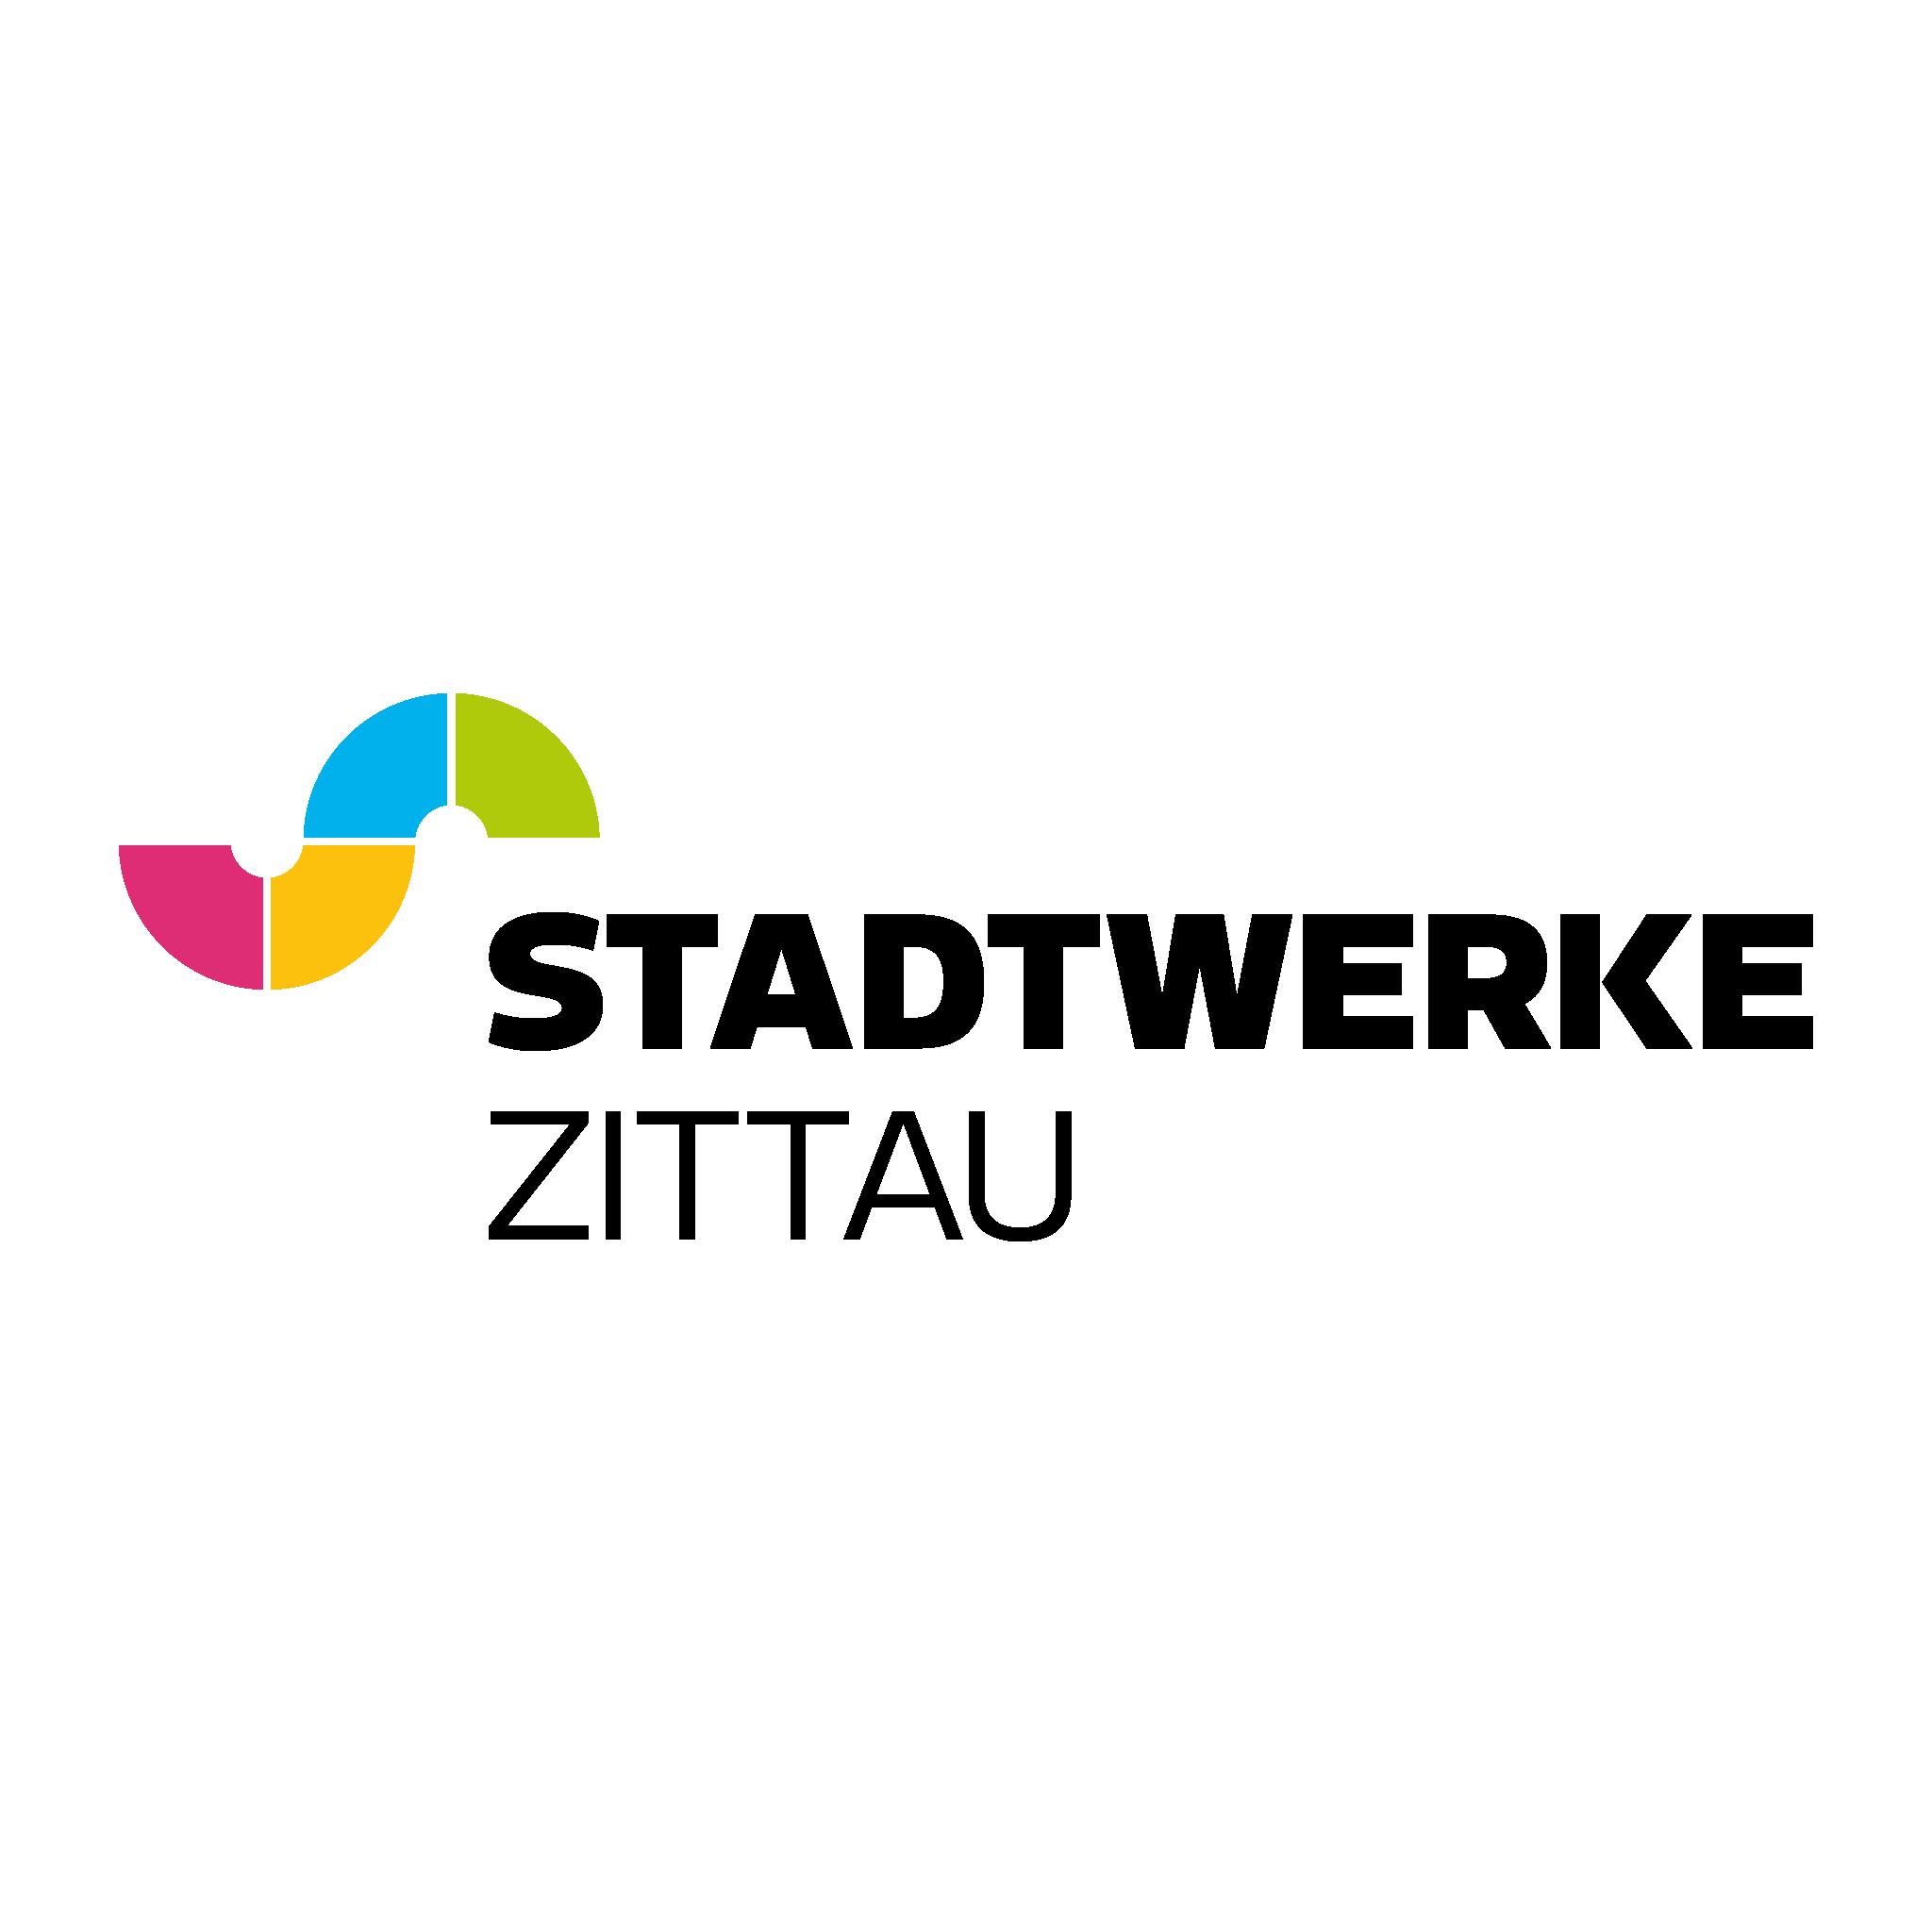 Stadtwerke Zittau